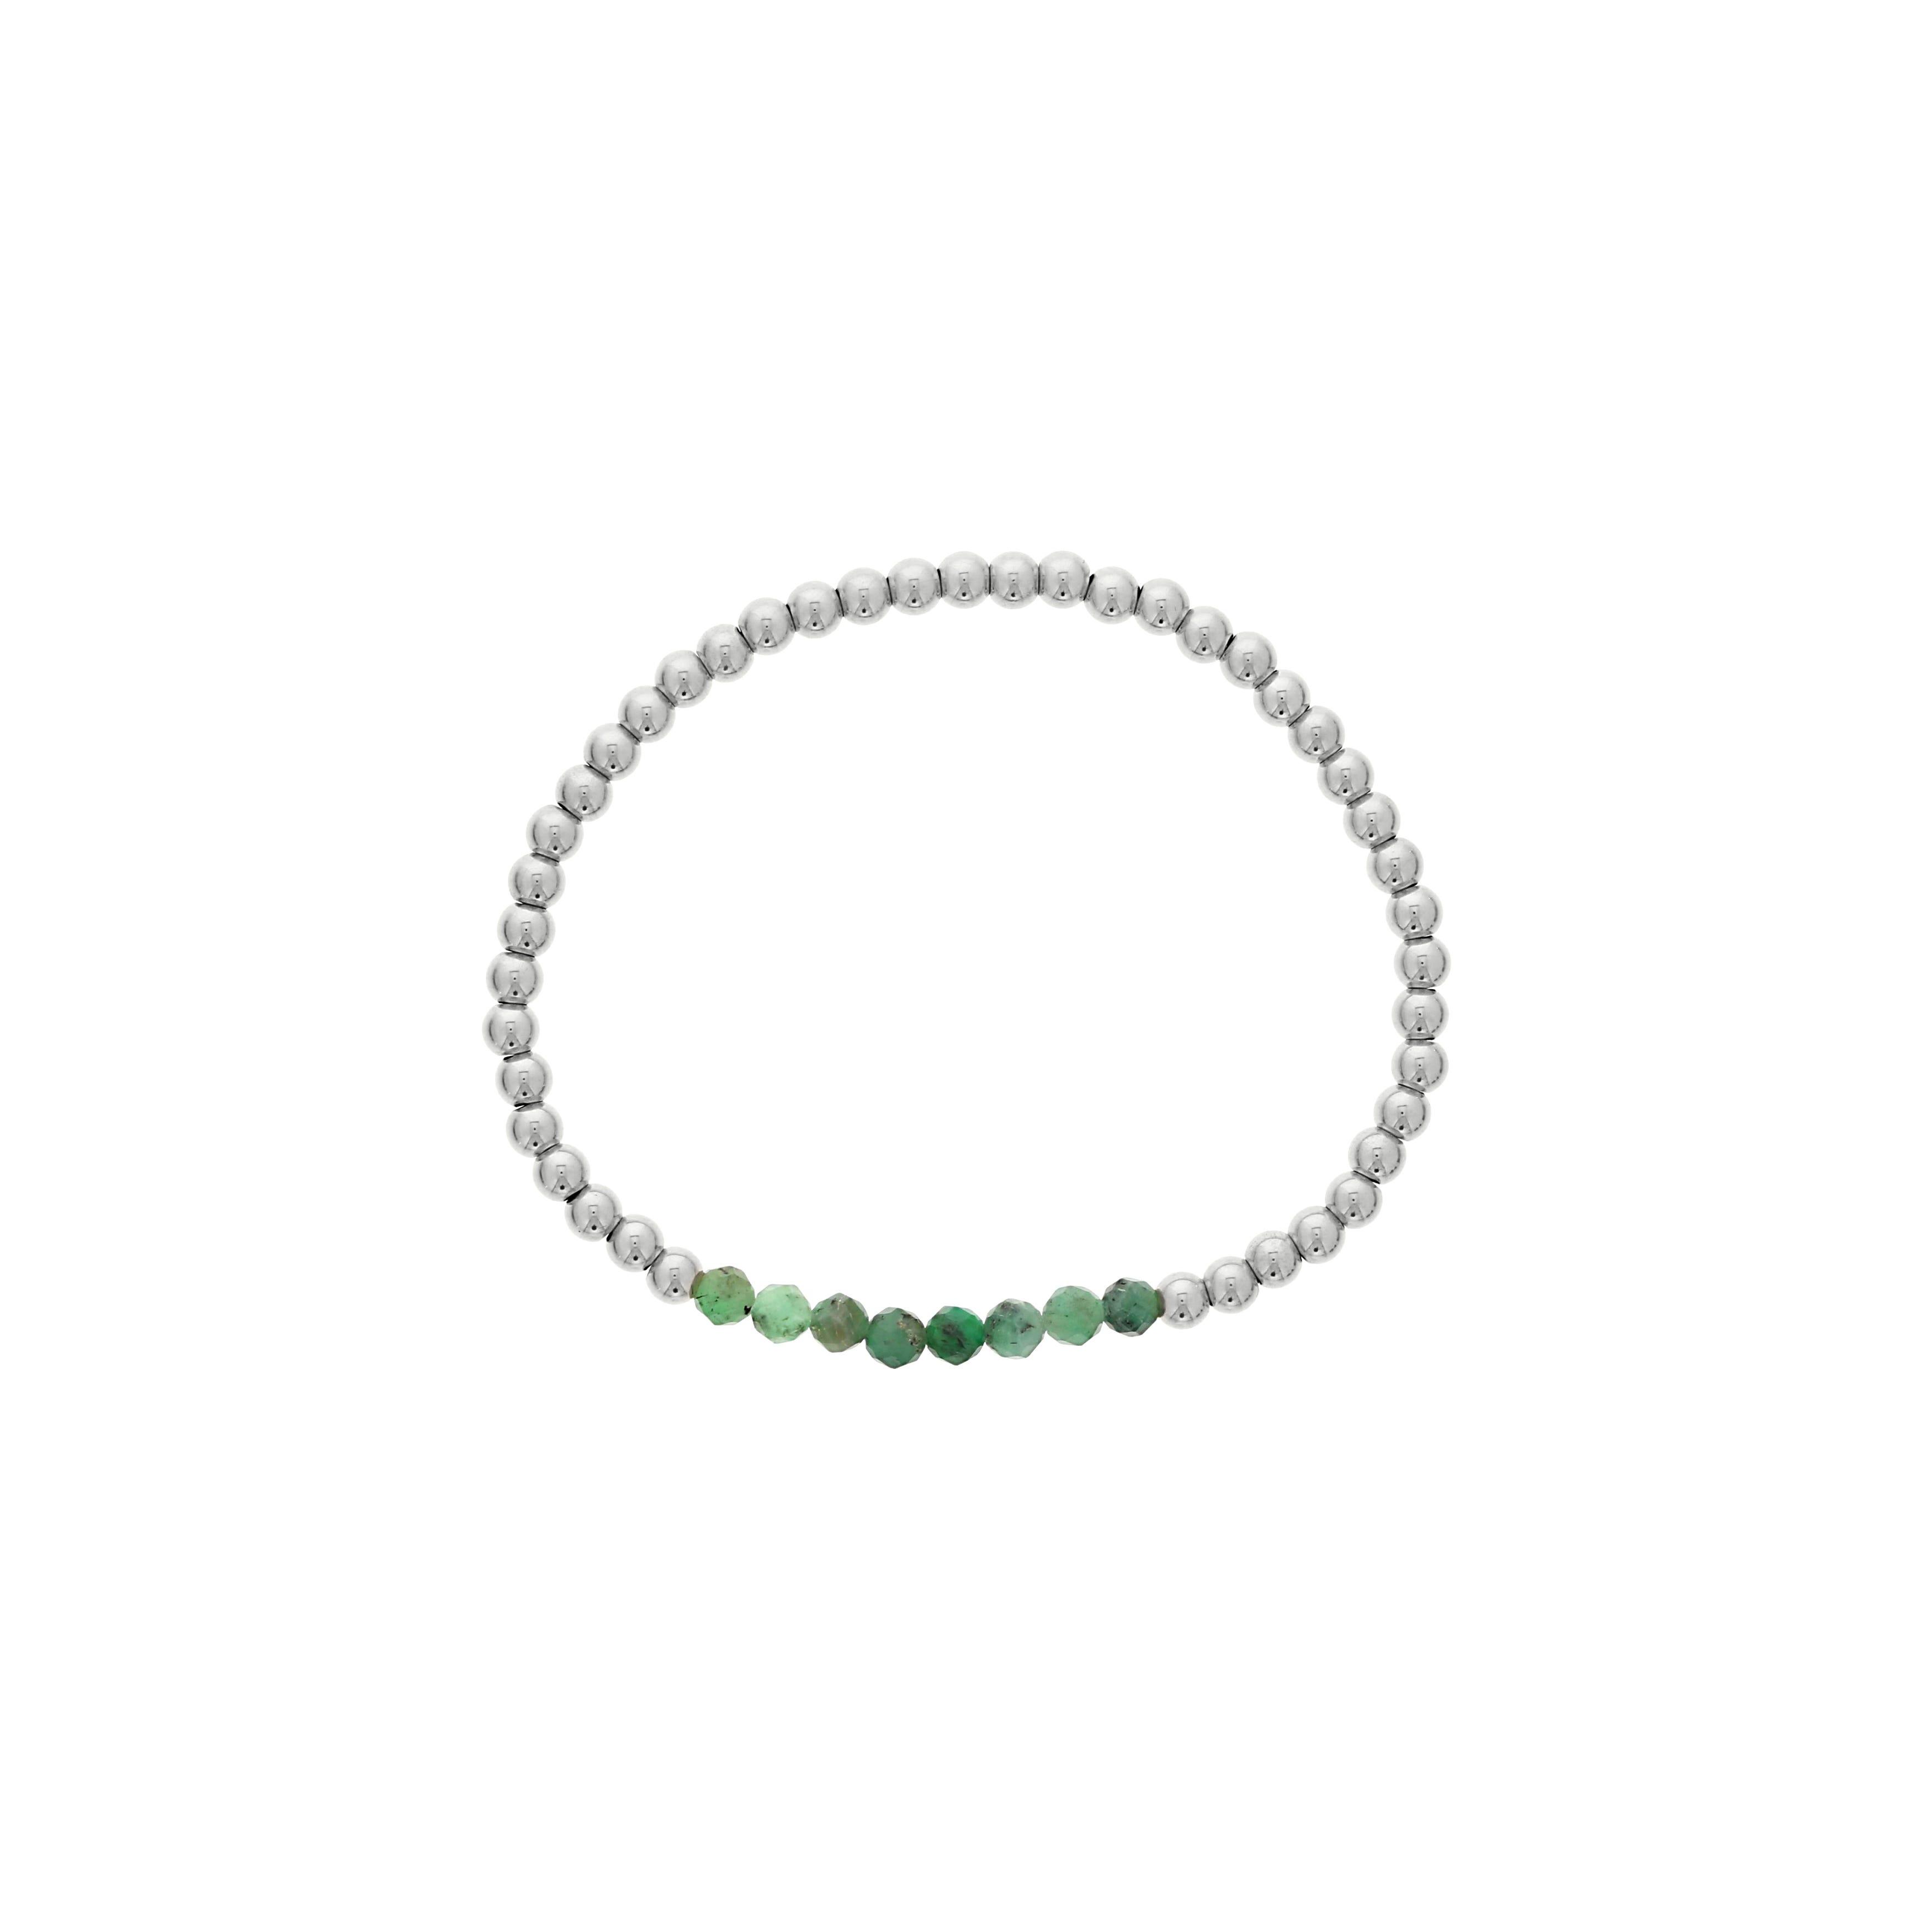 Emerald Birthstone Beaded Bracelet in Sterling Silver